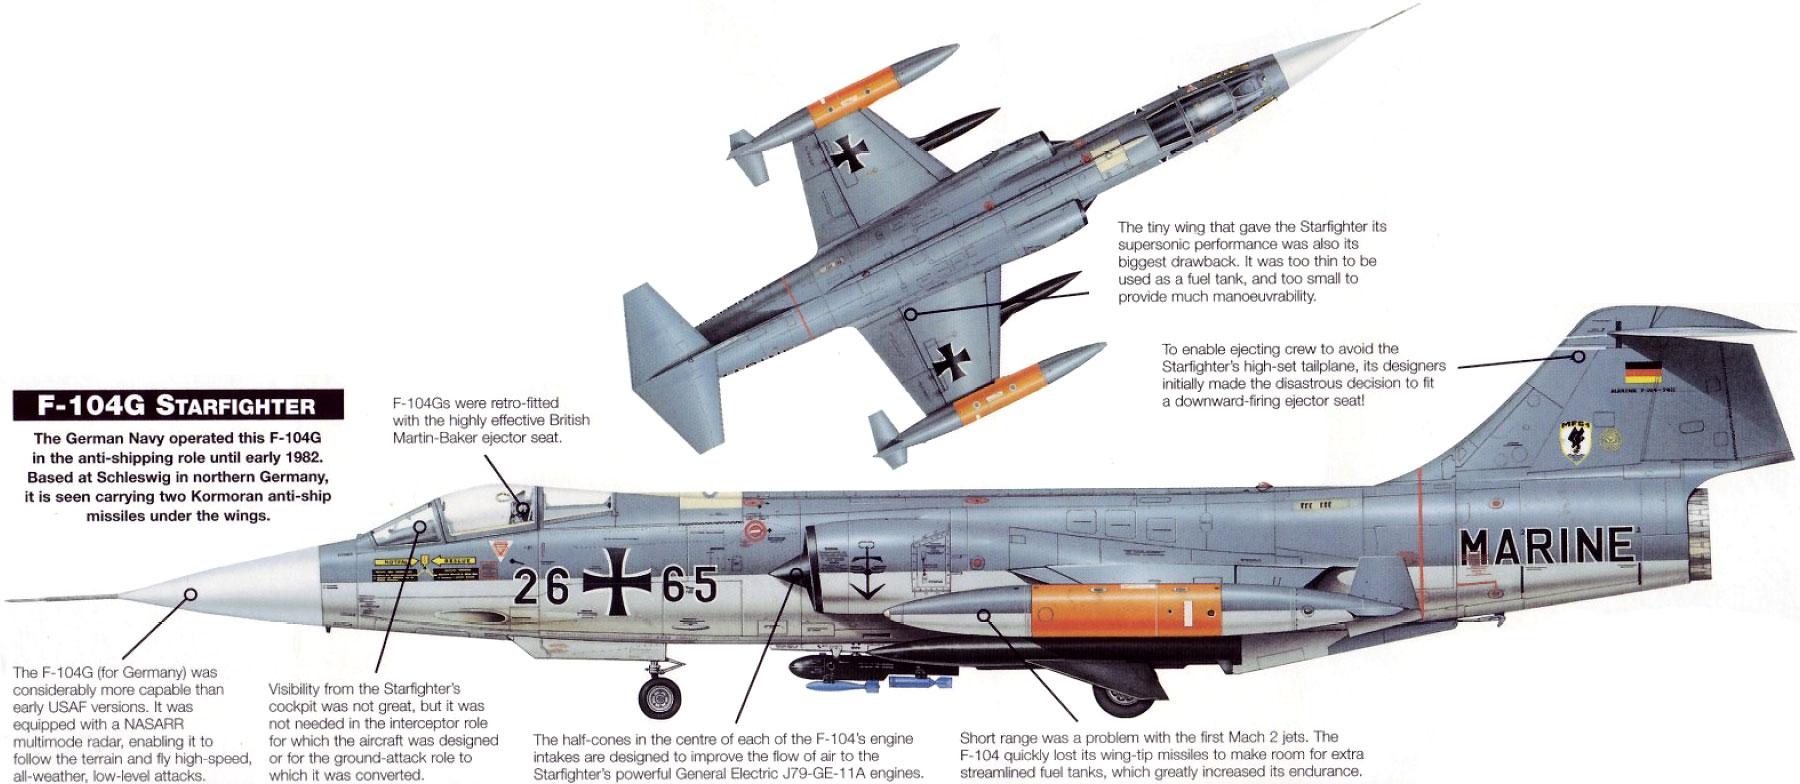 Lockheed F-104 Starfighter (3)